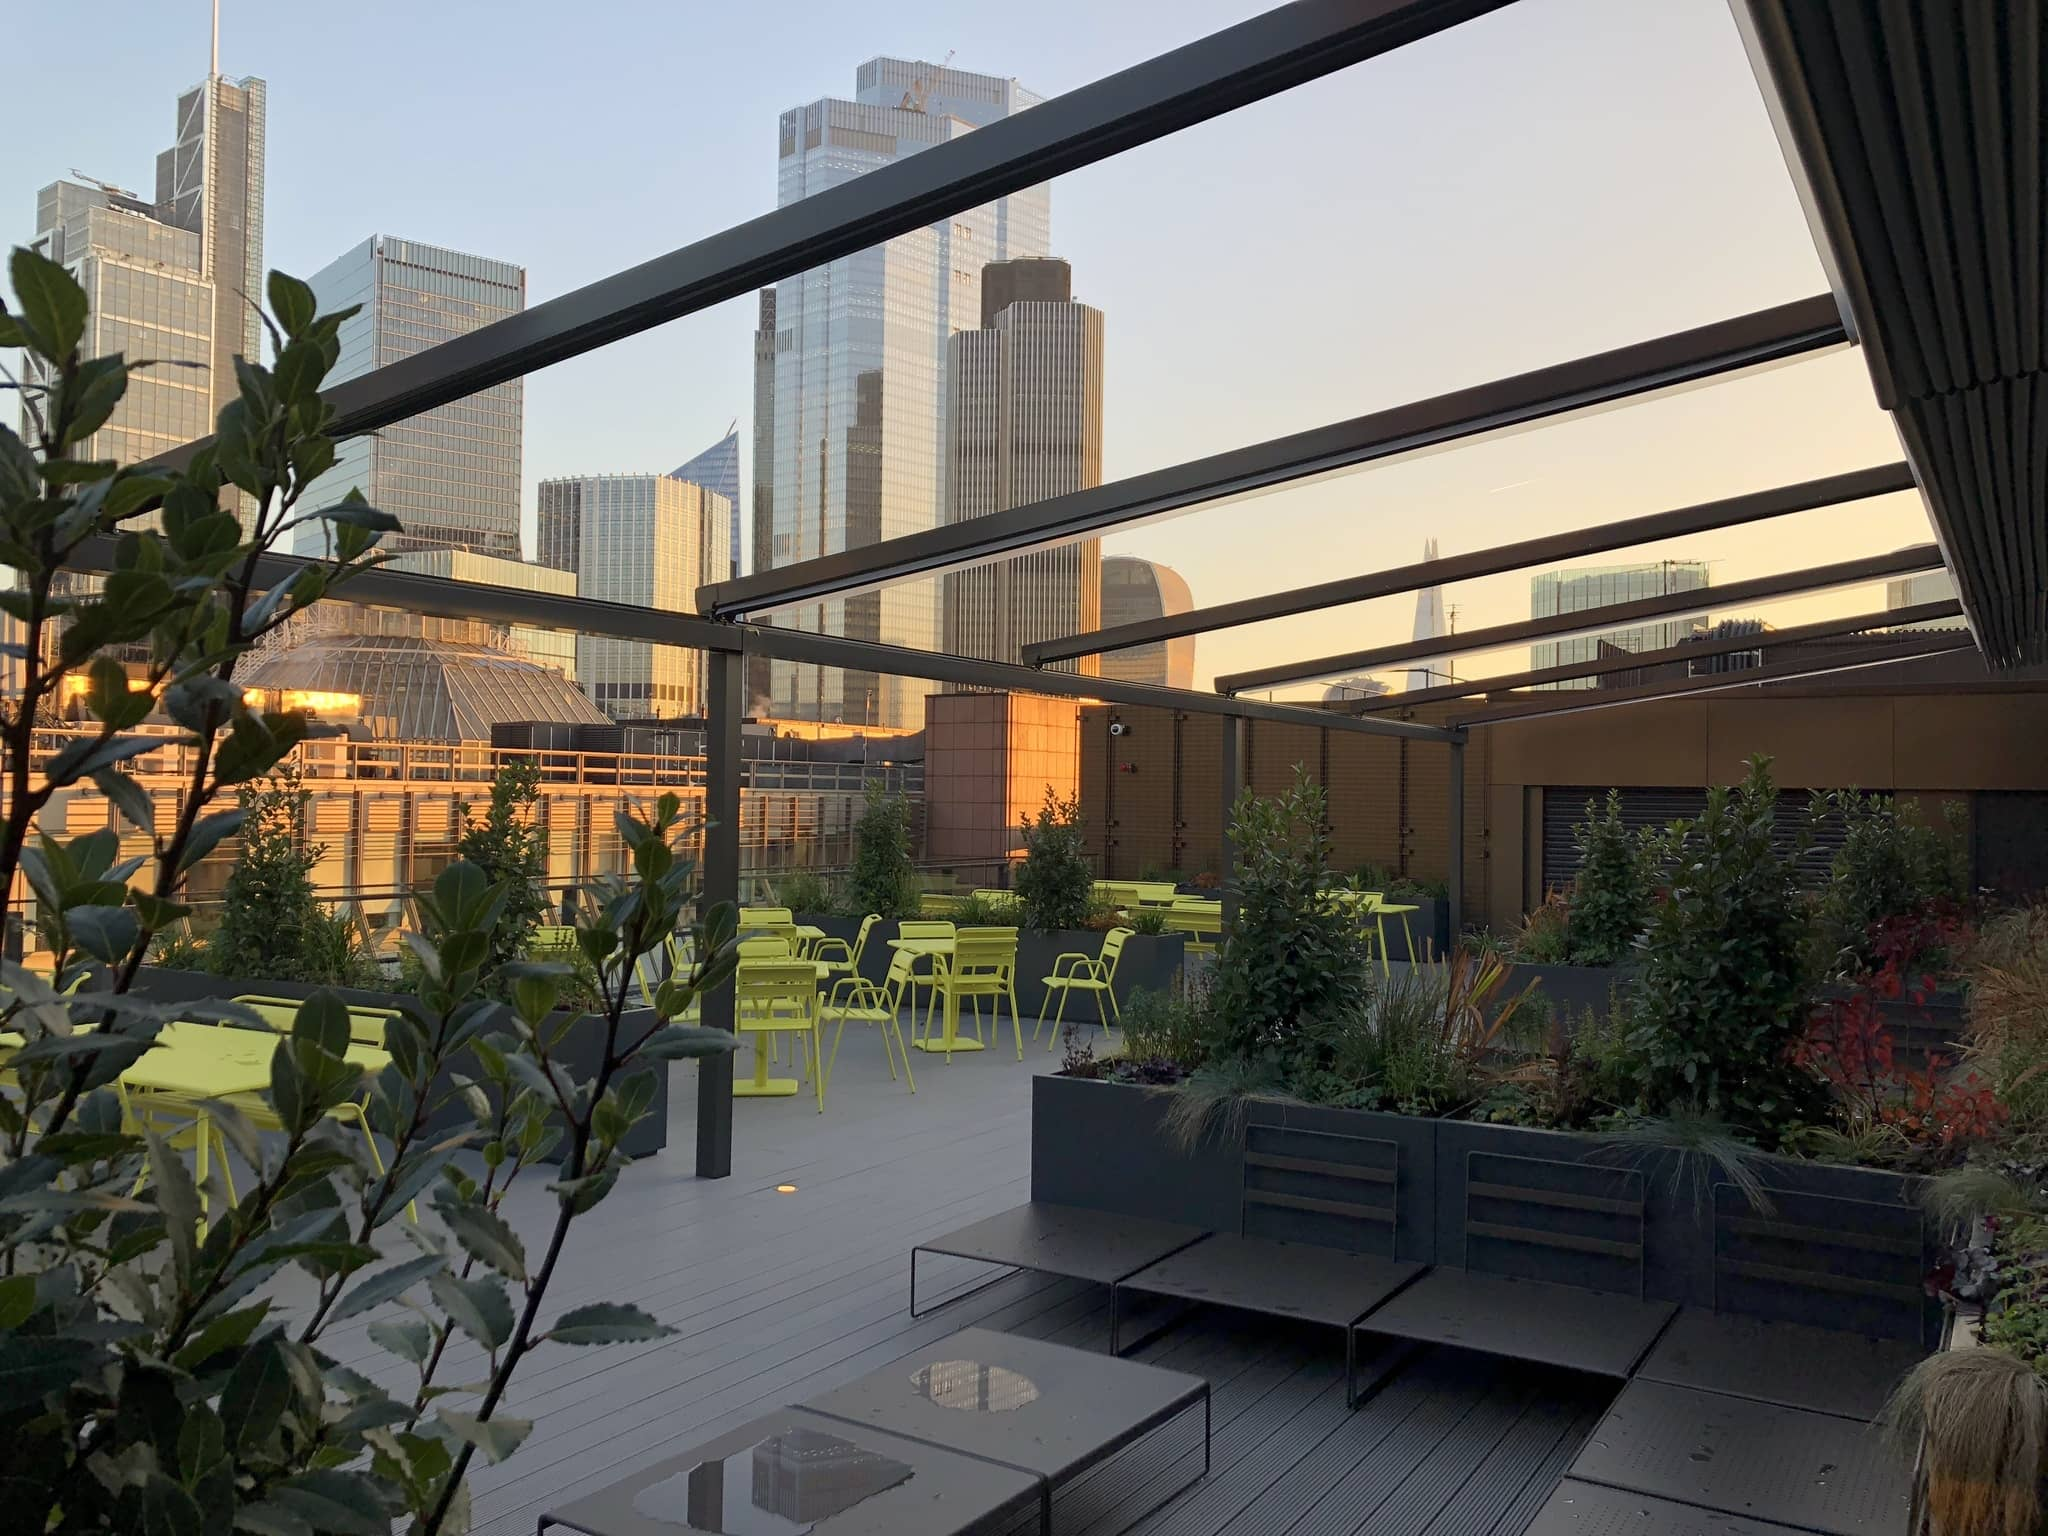 Rooftop Pergola   Retractable Canopies   Retractable Canopies